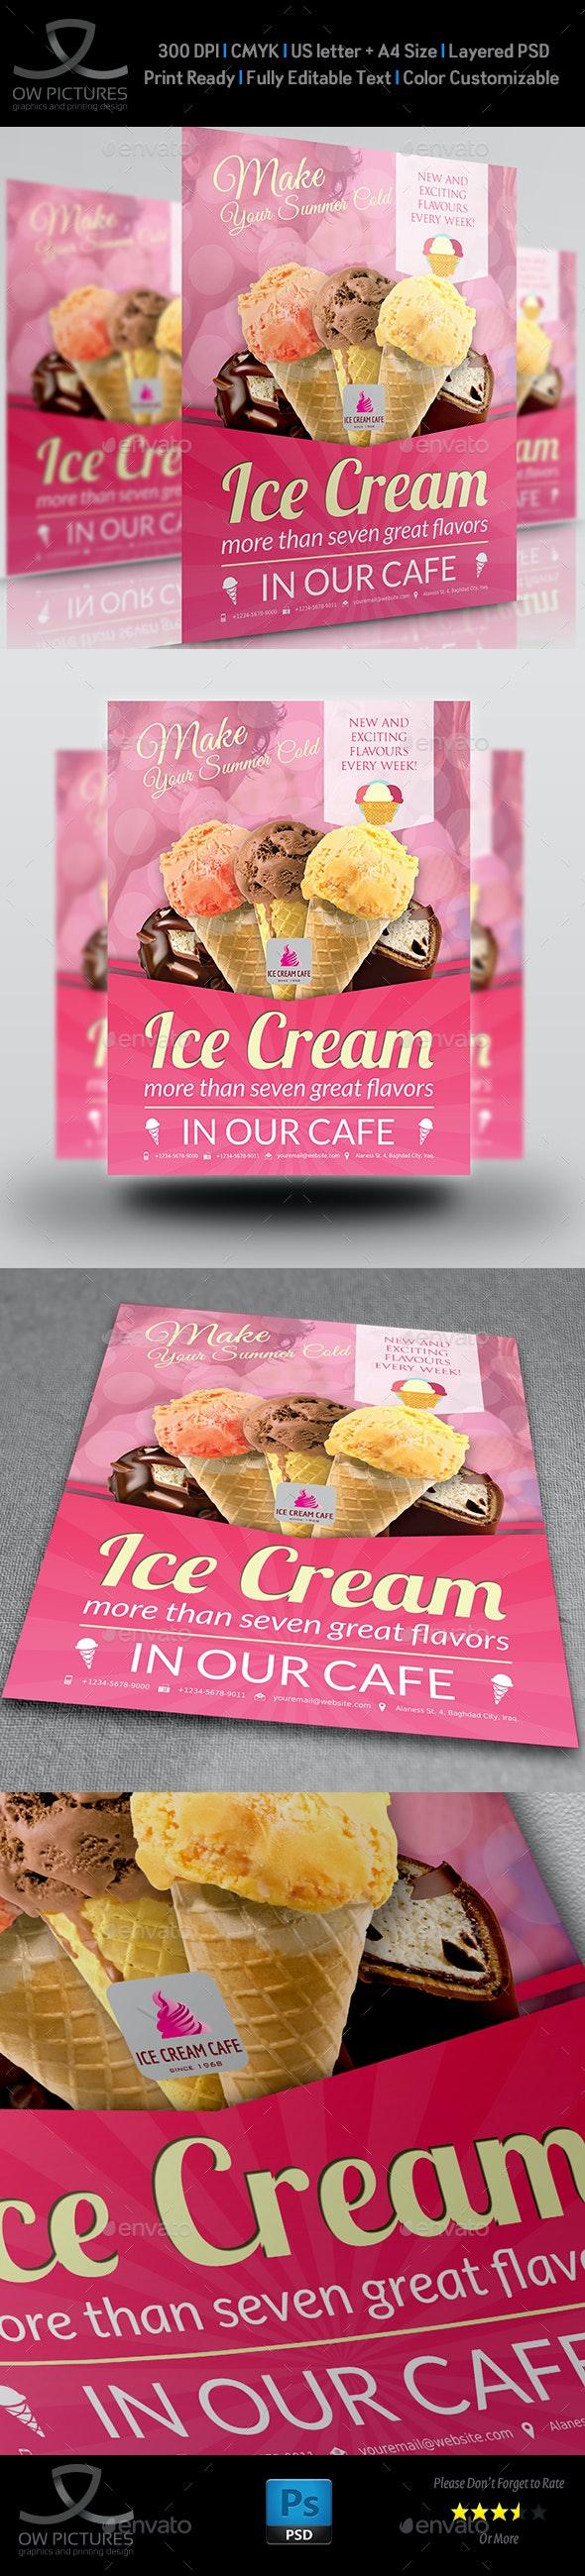 Ice Cream Flyer Template Vol.4 - Restaurant Flyers